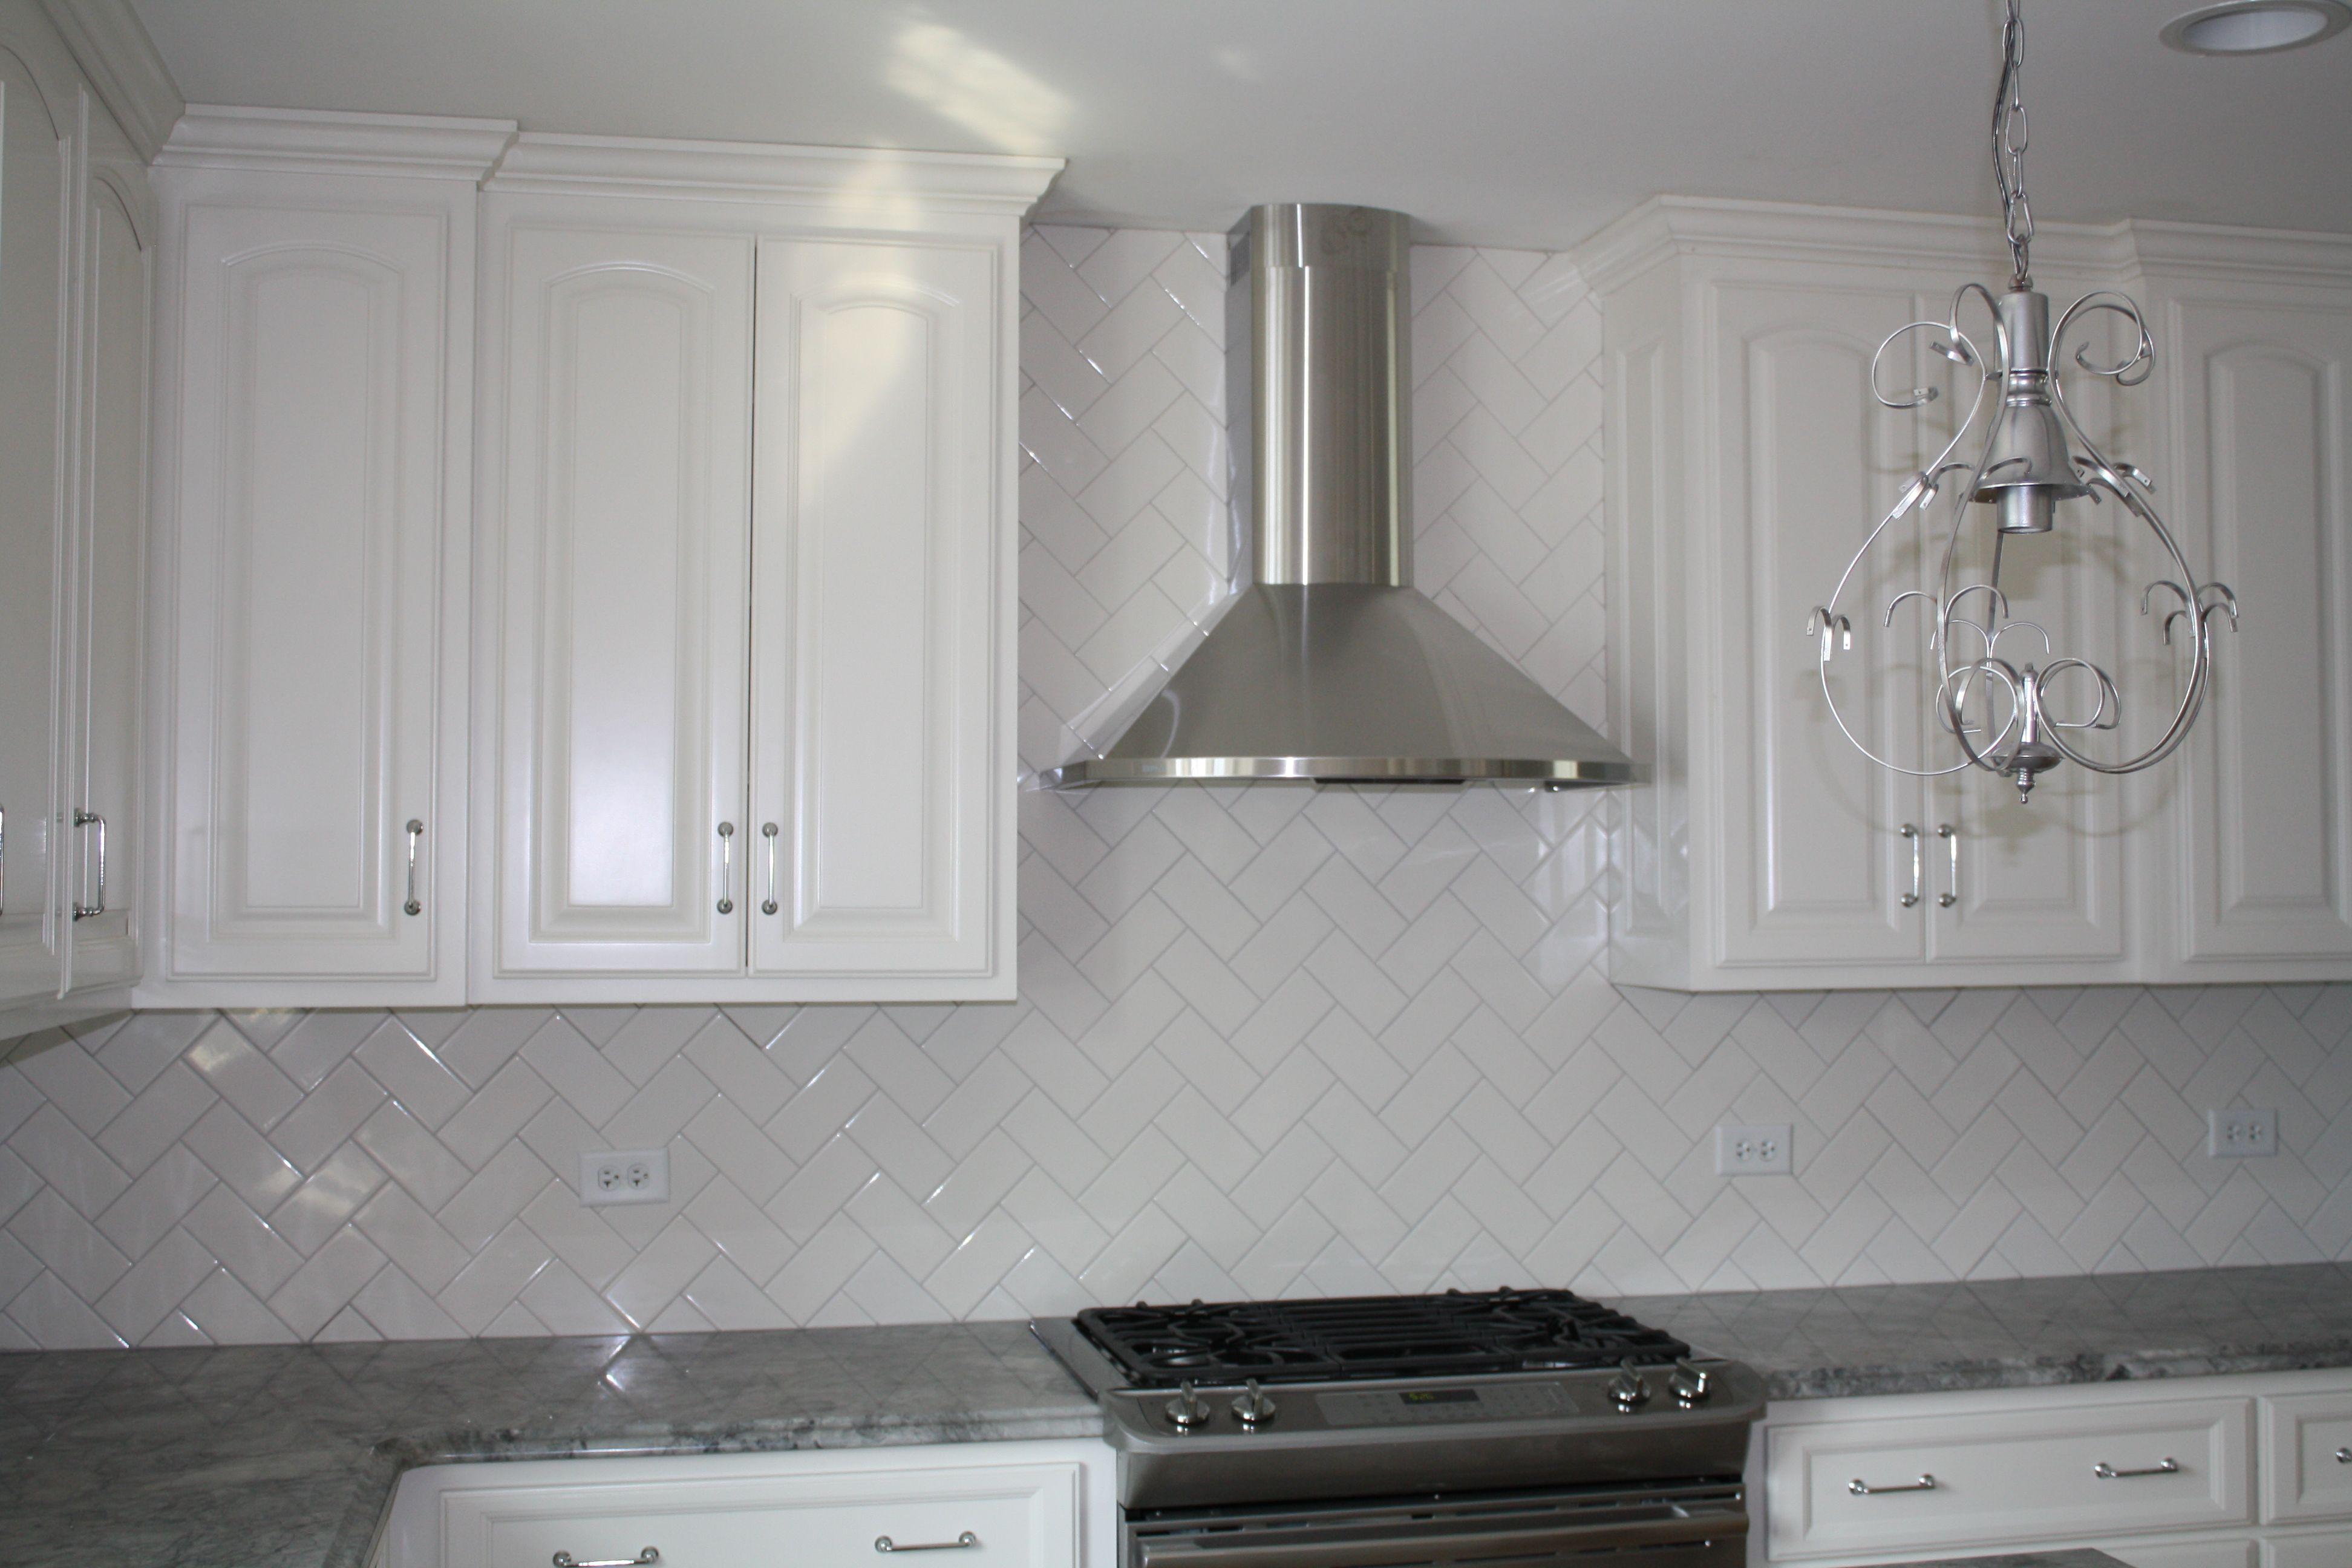 Perfect Installing Kitchen Stove Backsplash Behind Stove With